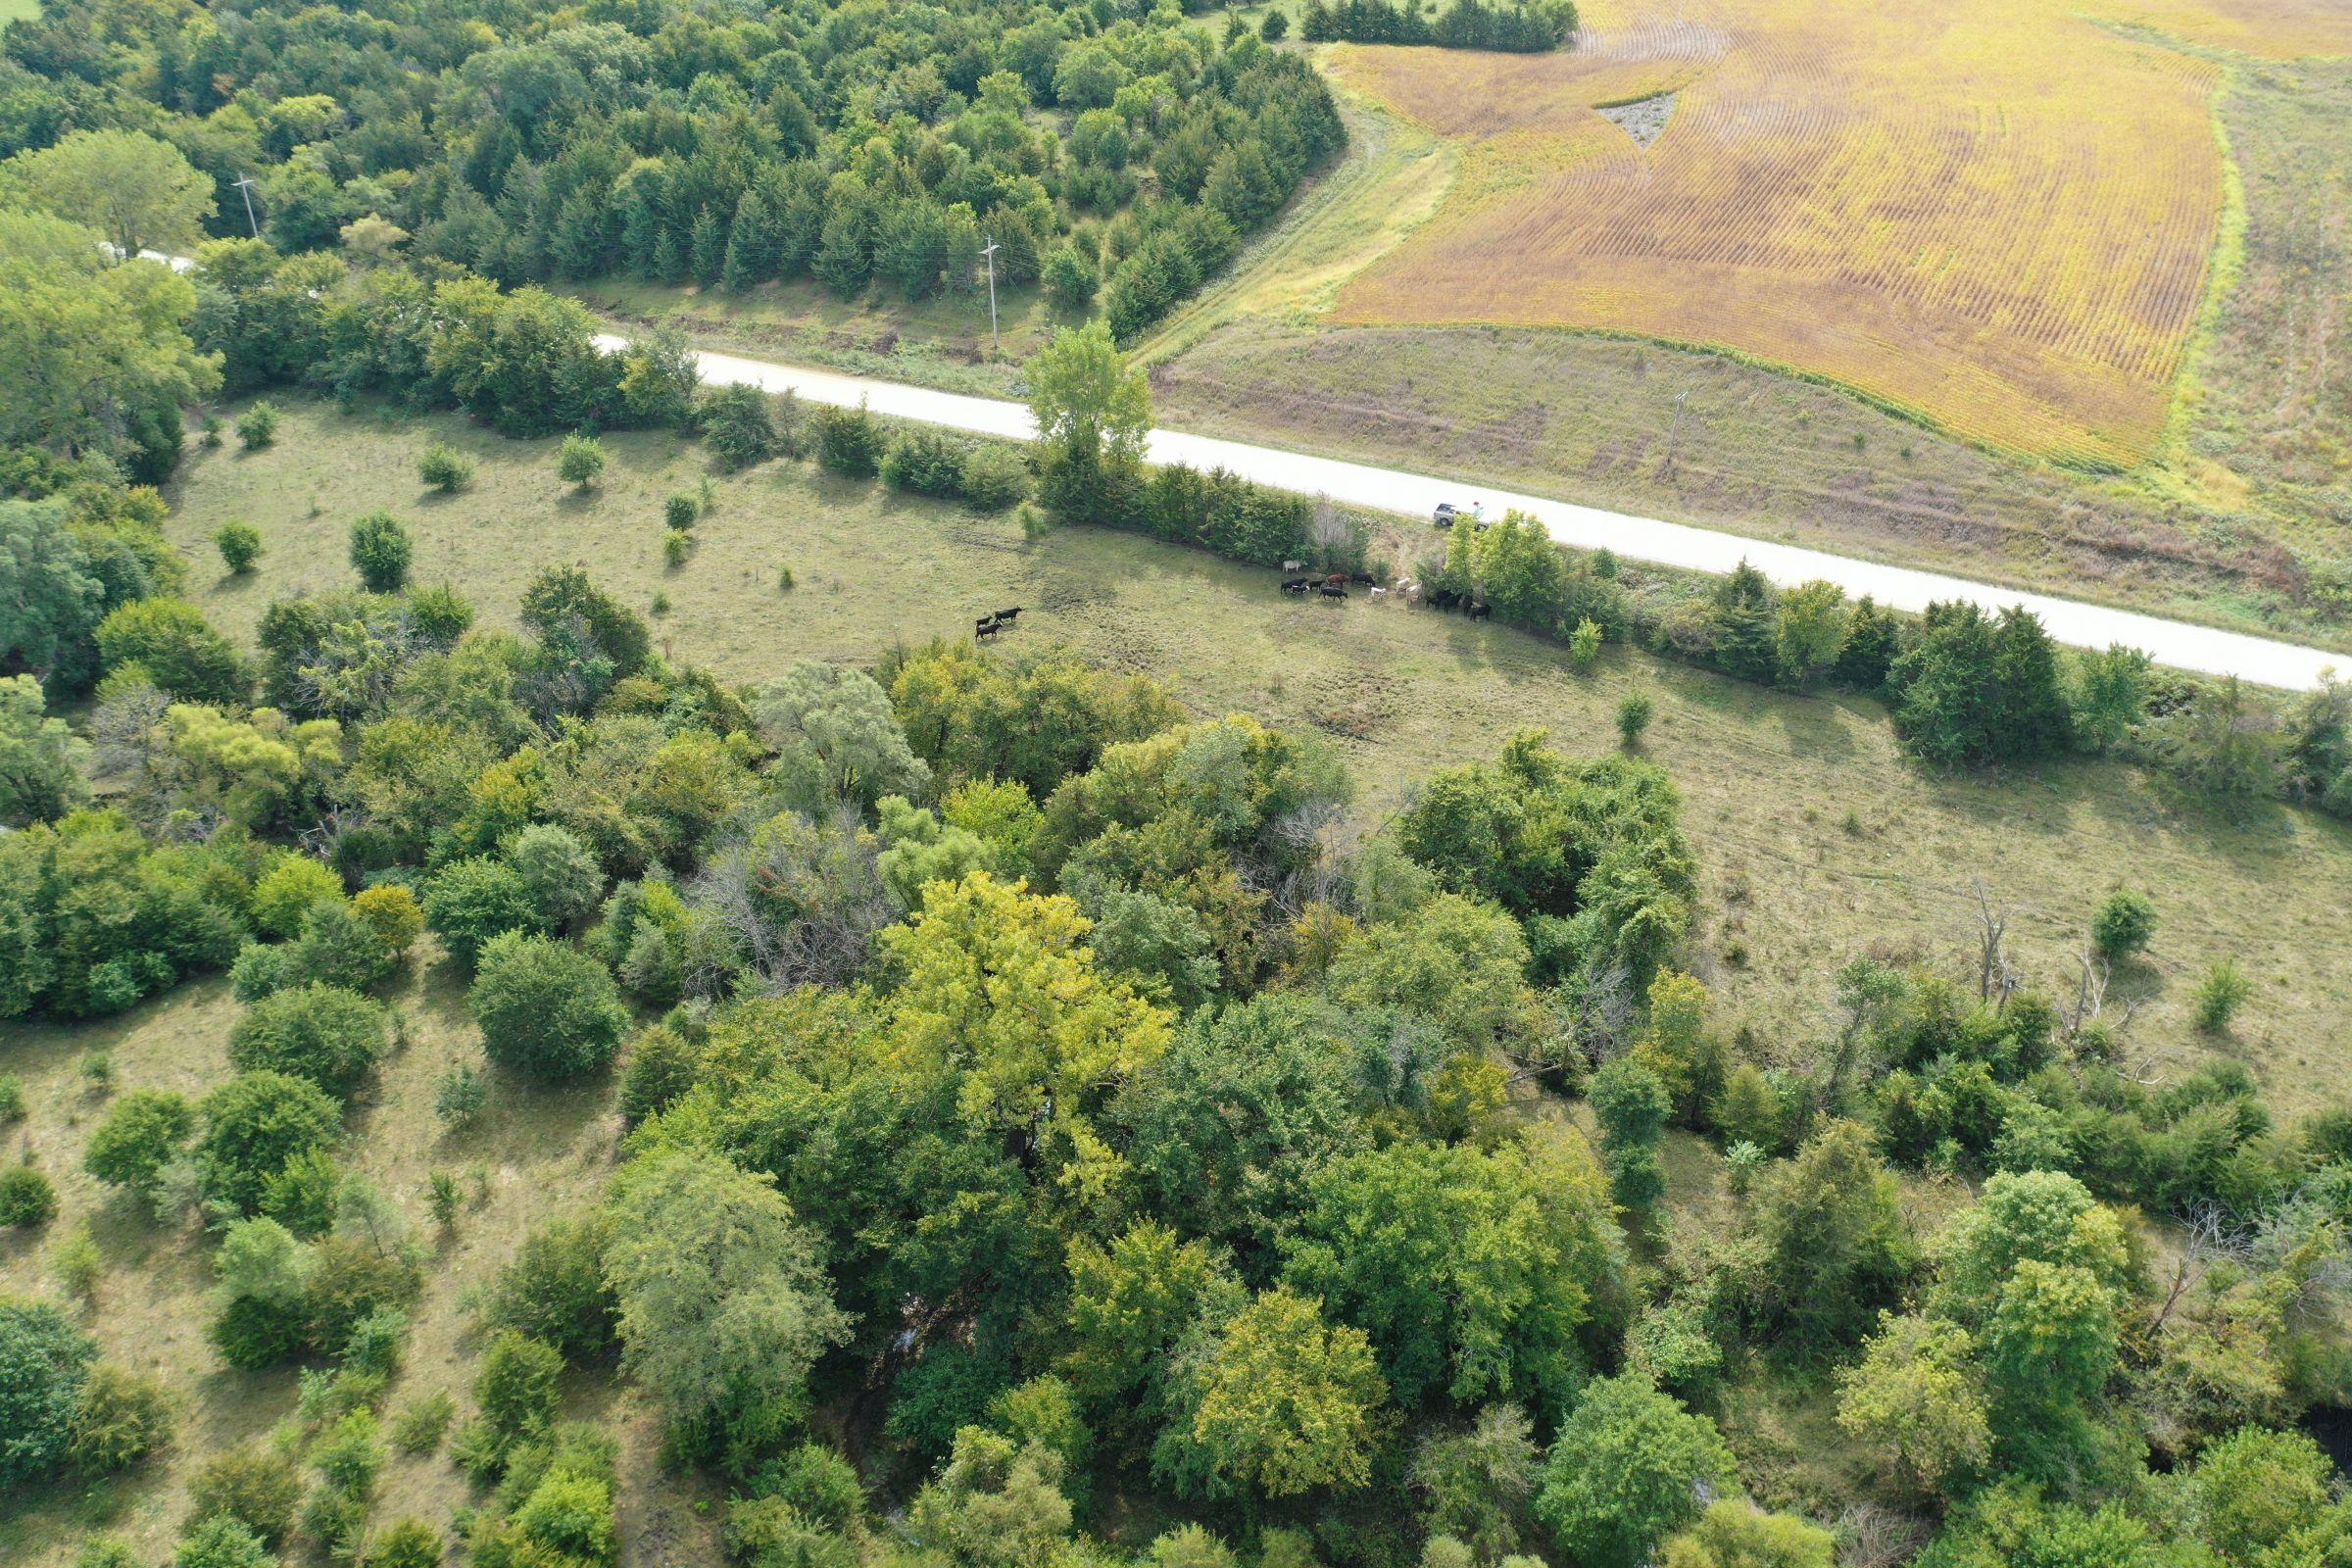 clarke-county-iowa-37-acres-listing-number-15398-2-2021-03-08-151152.jpg